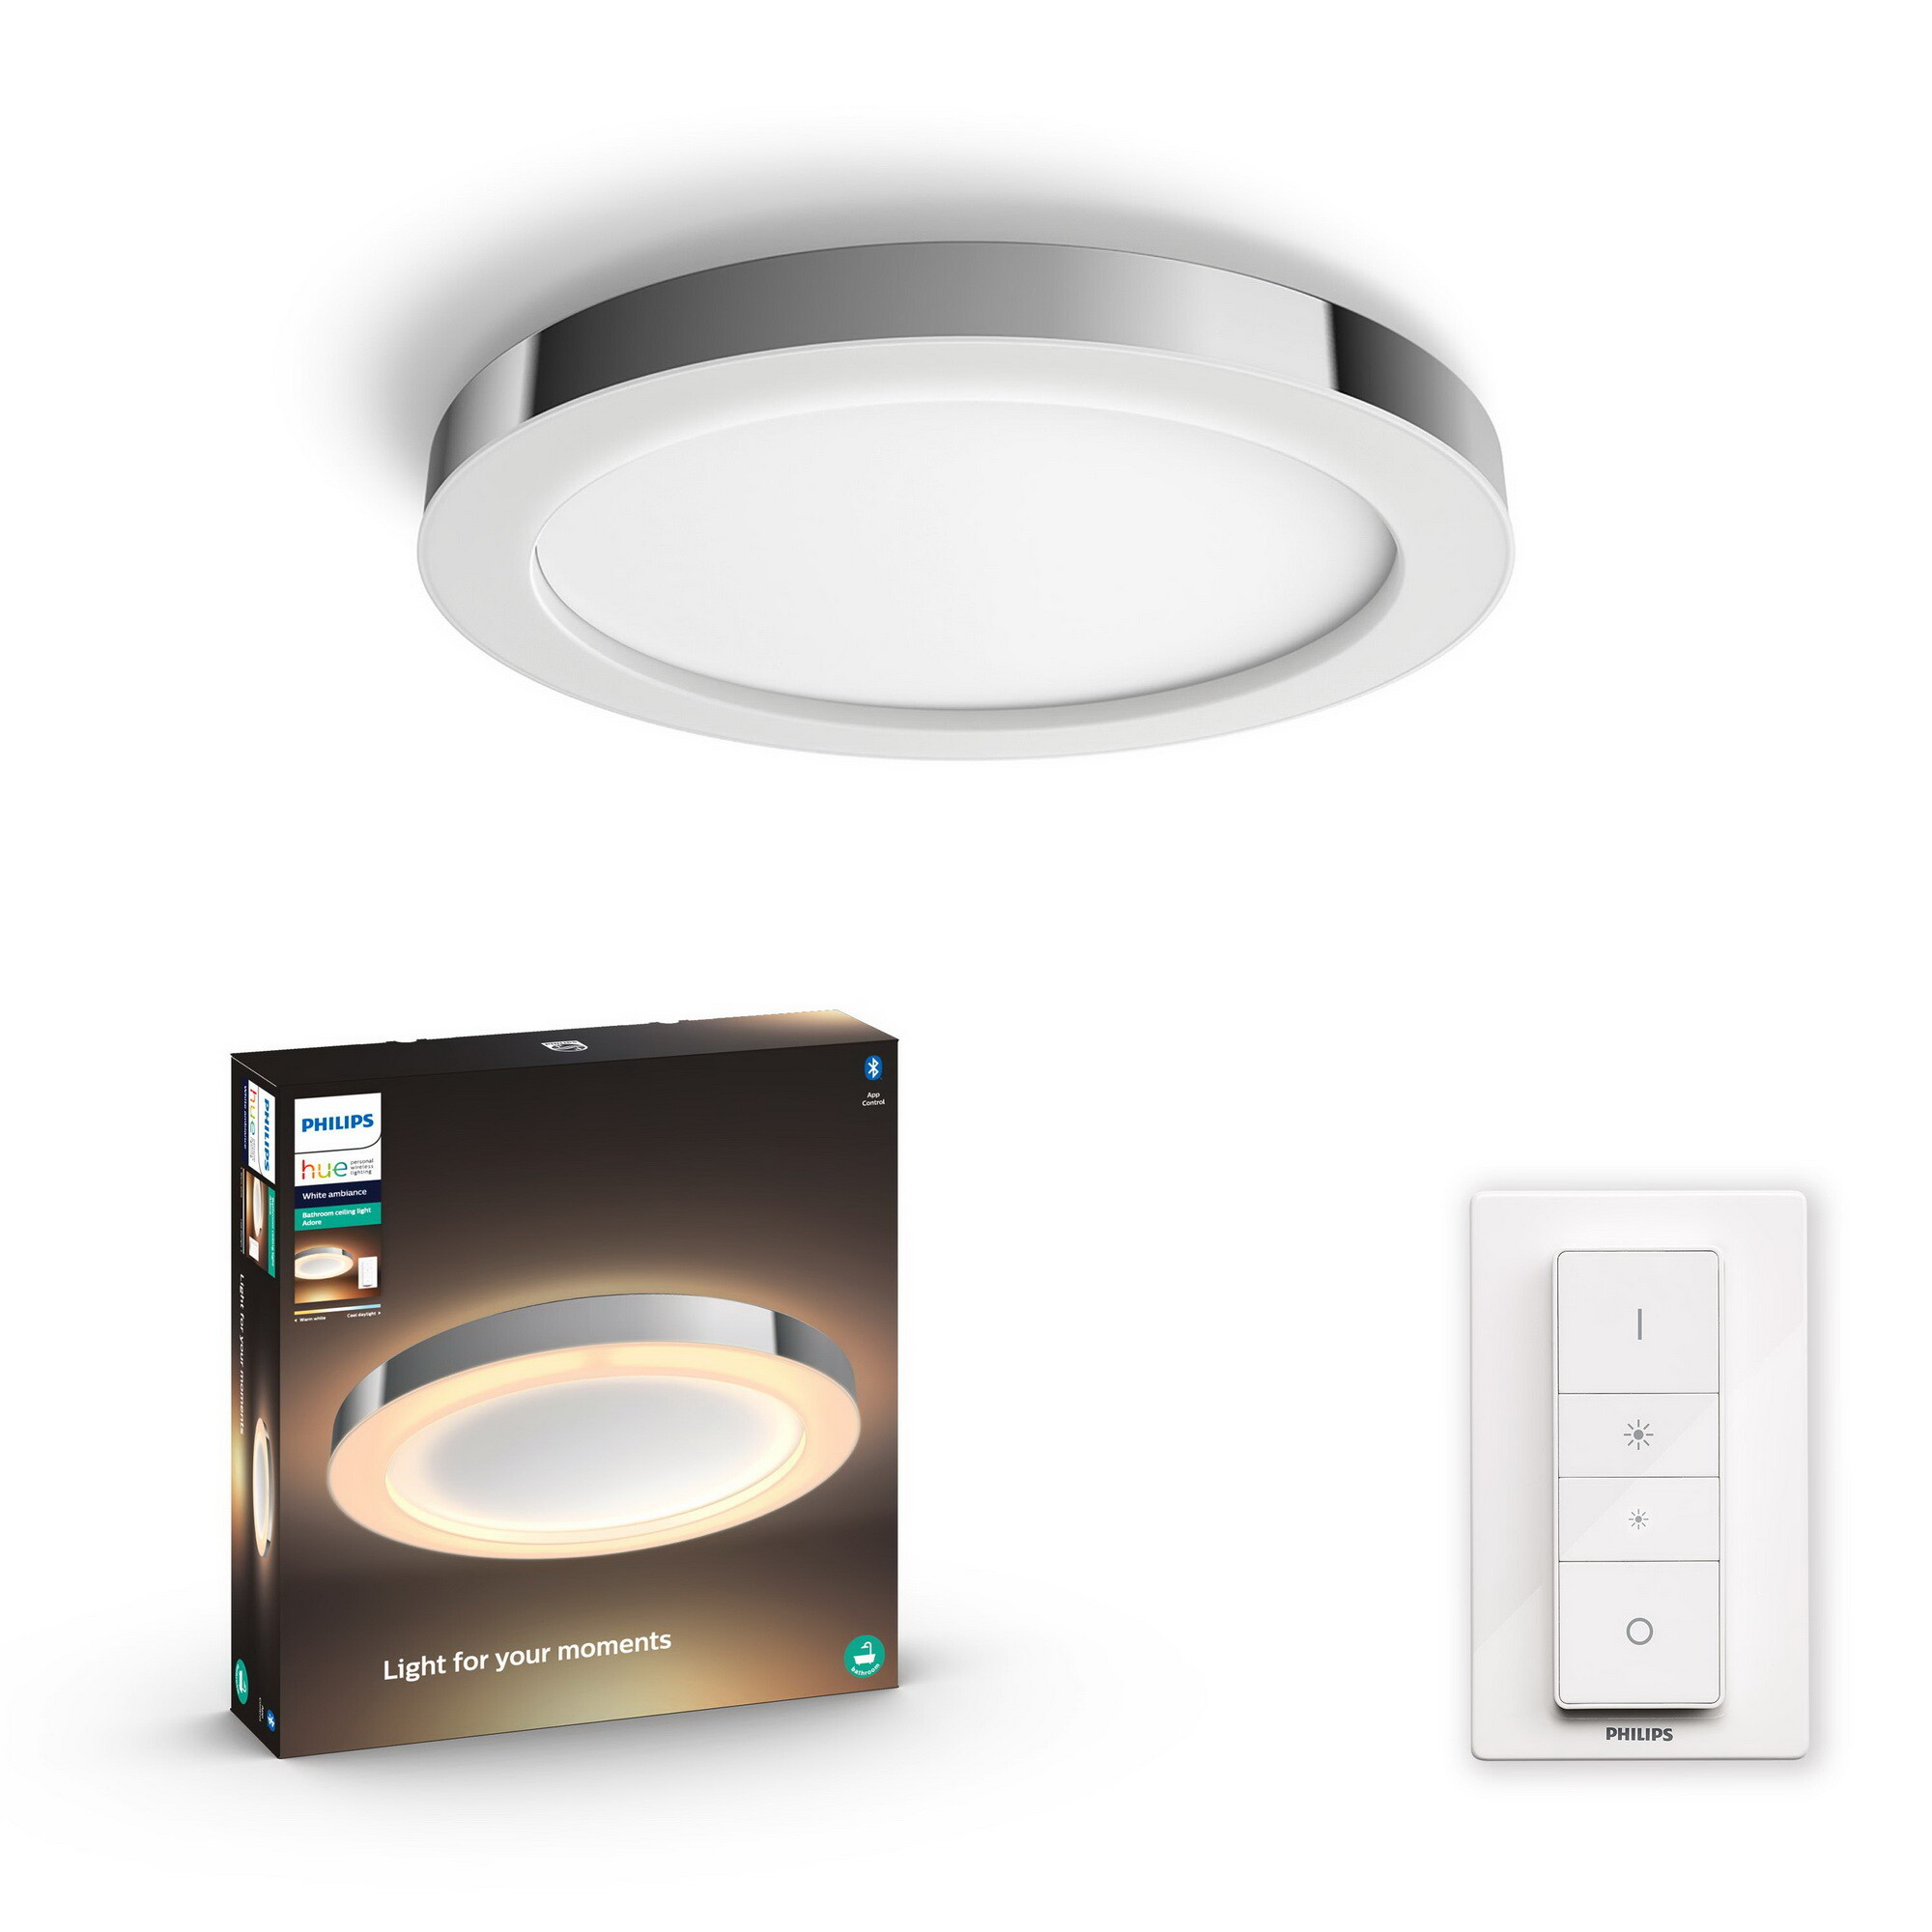 Philips HUE ADORE Plafondlamp LED 1x40W/2400lm Zilver